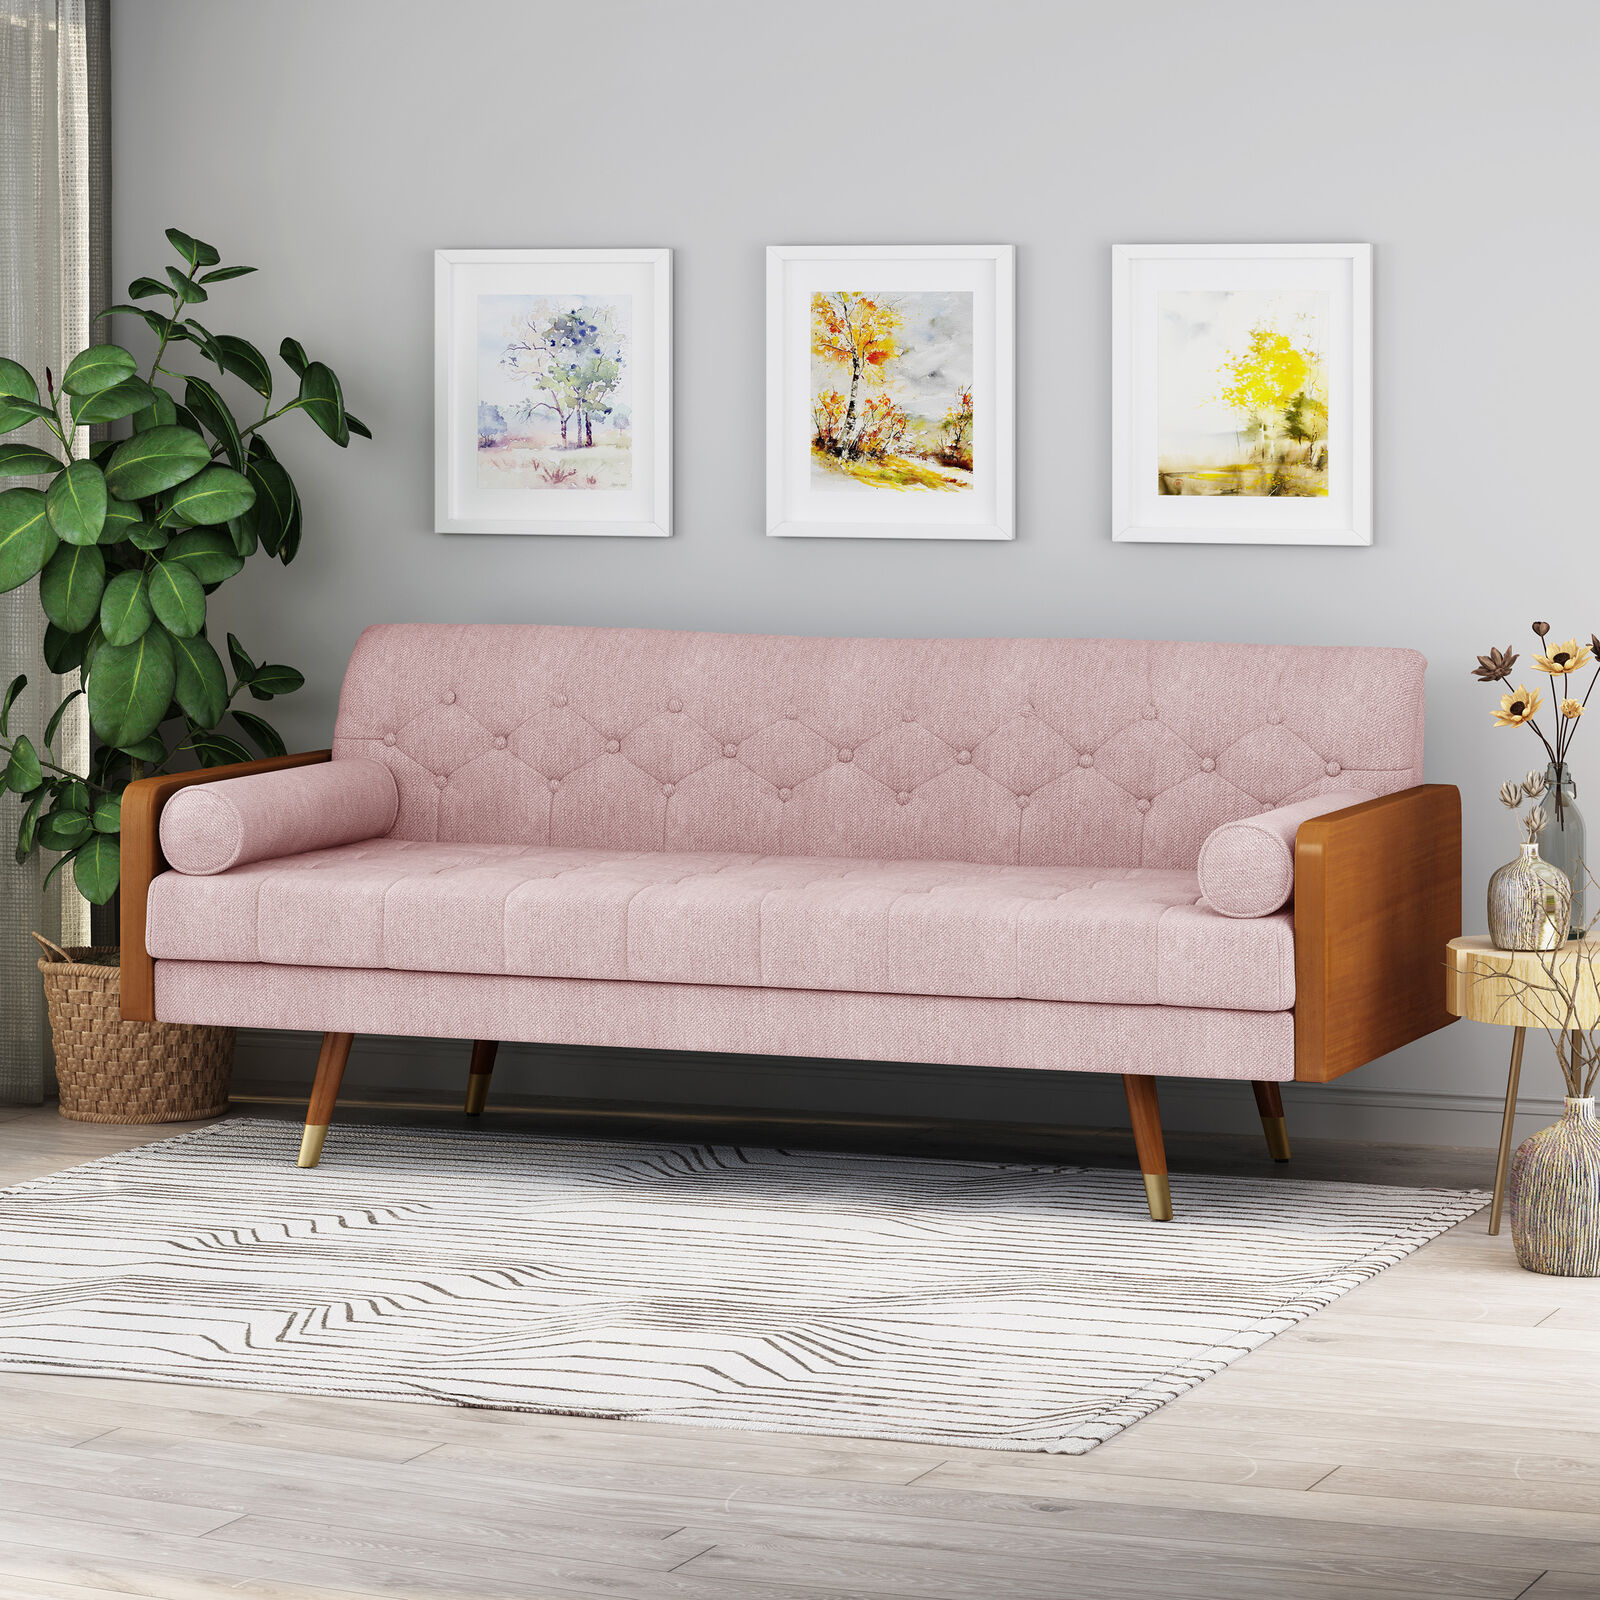 Aidan Mid-Century Modern Tufted Fabric Sofa Furniture